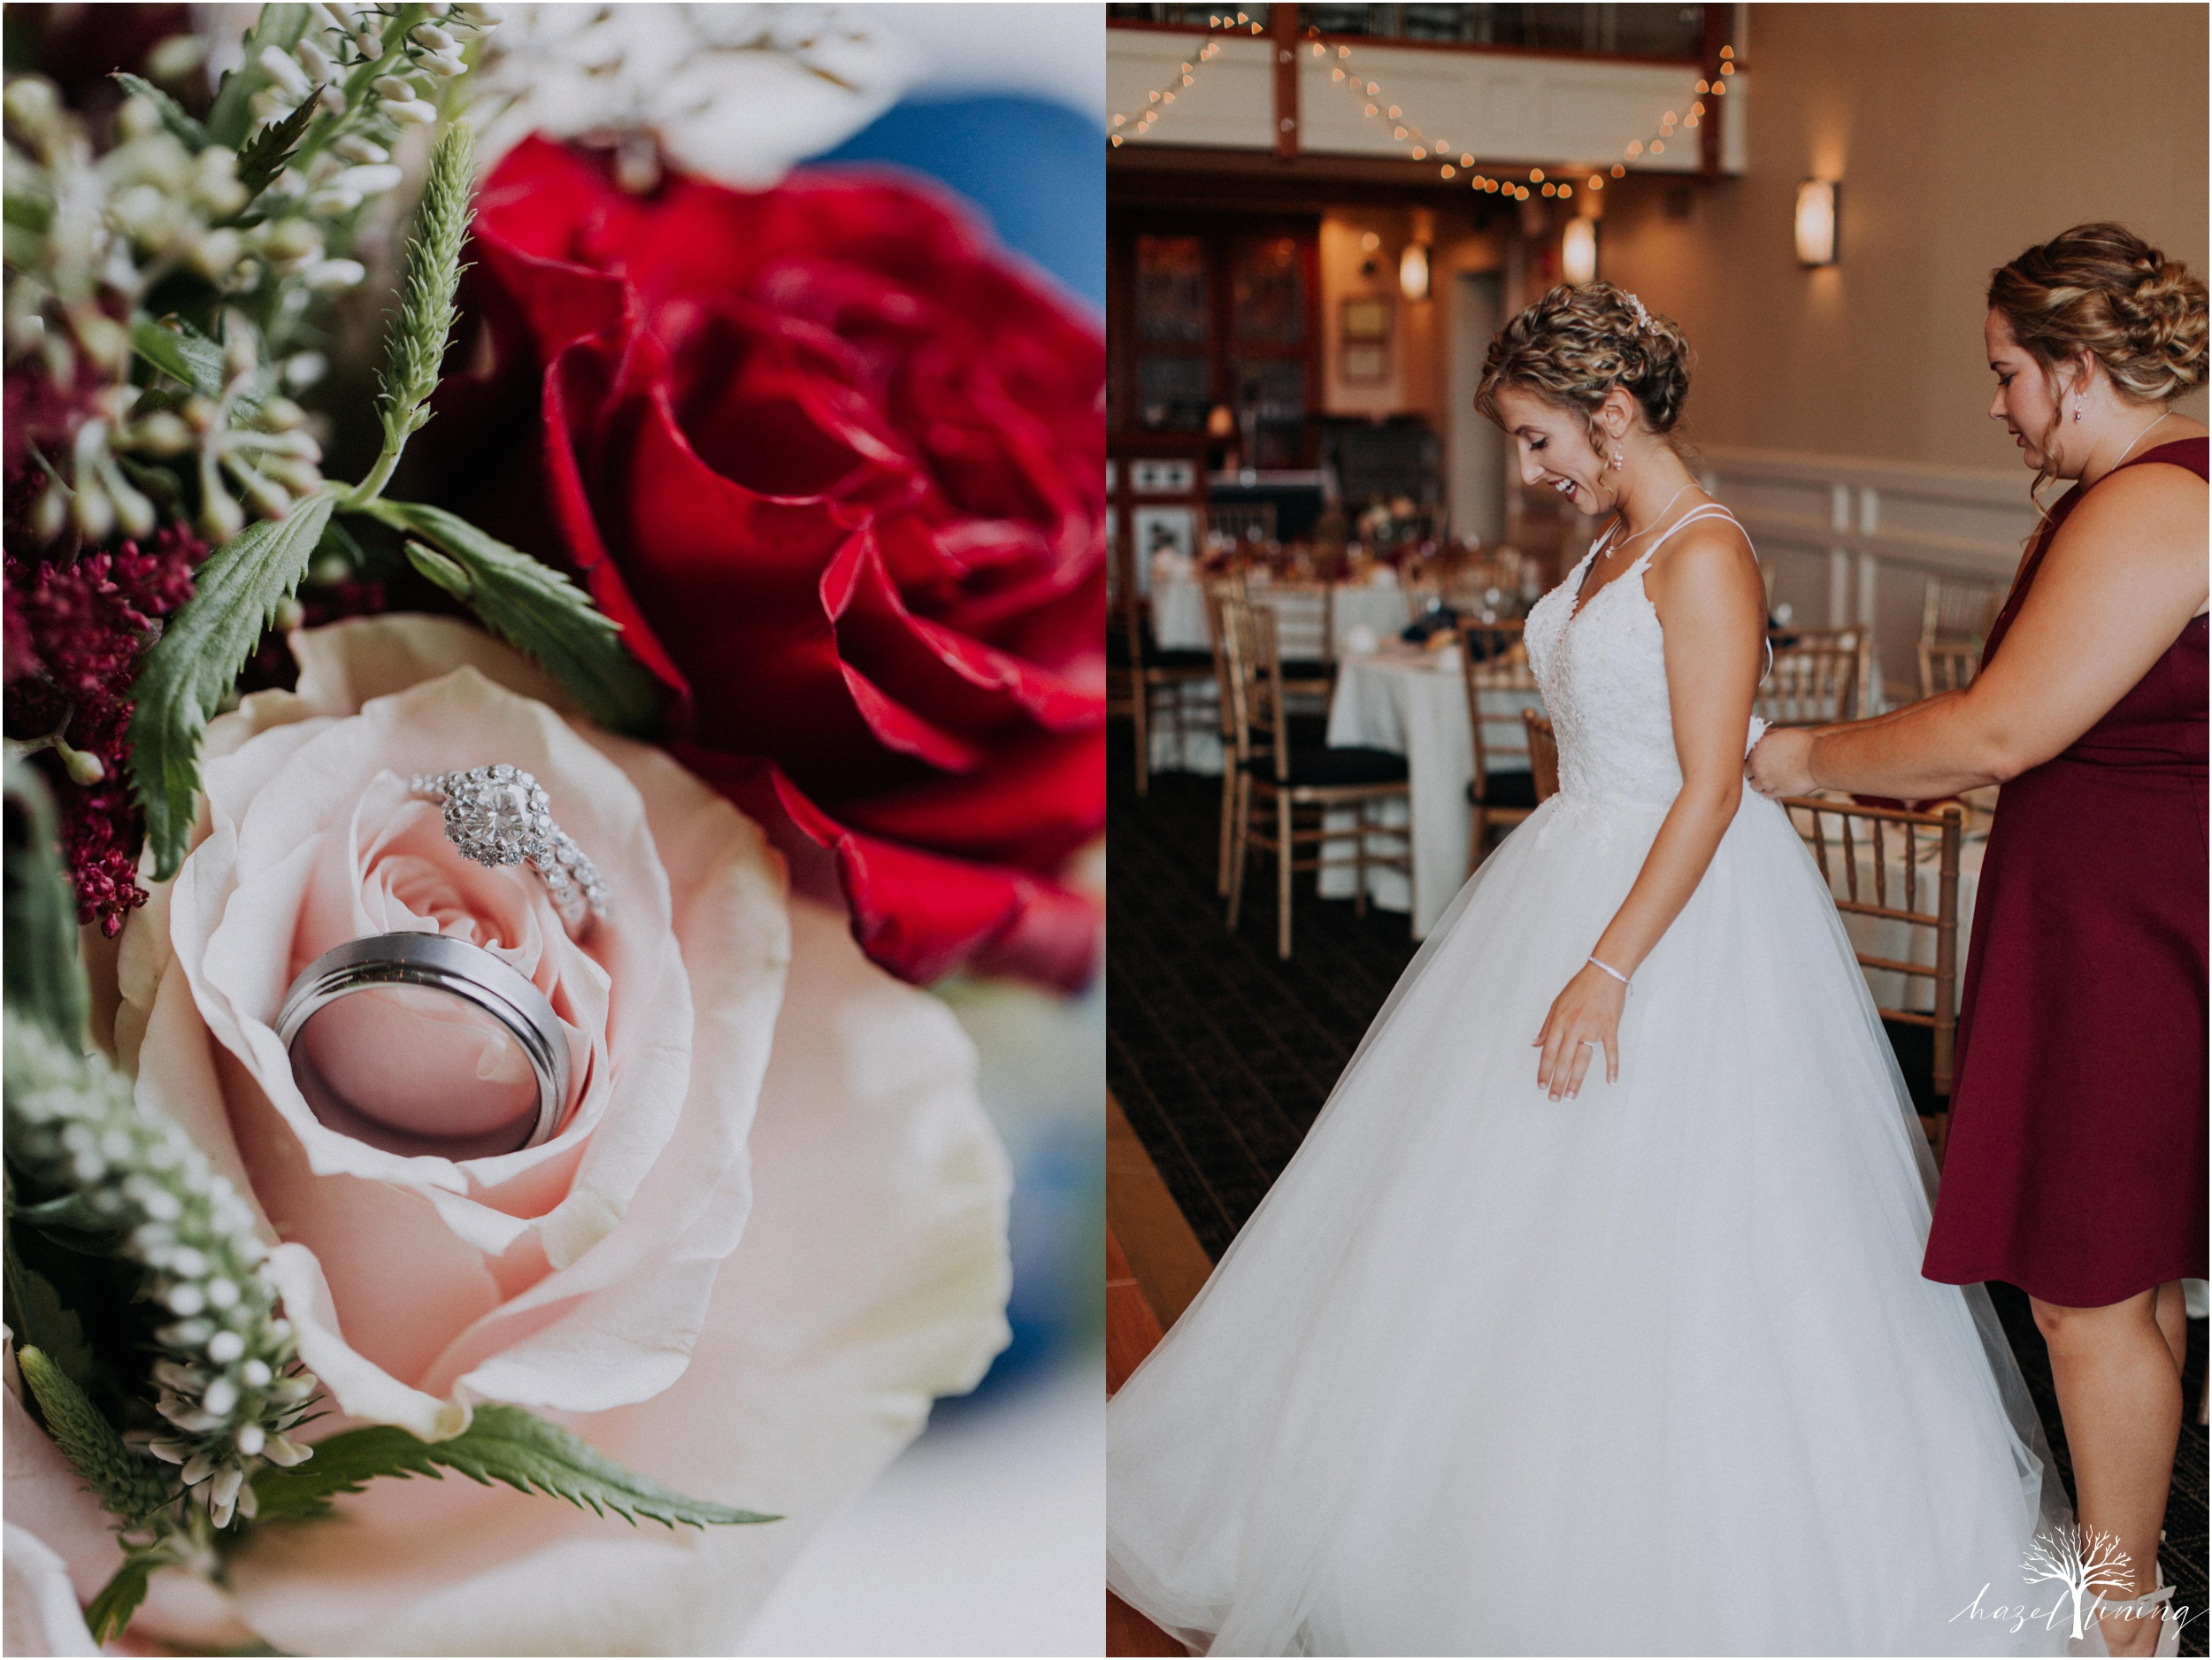 jonathan-weibel-becky-haywood-loft-at-sweetwater-cc-pennsburg-pennsylvania-rainy-day-summer-wedding-hazel-lining-travel-wedding-elopement-photography_0016.jpg